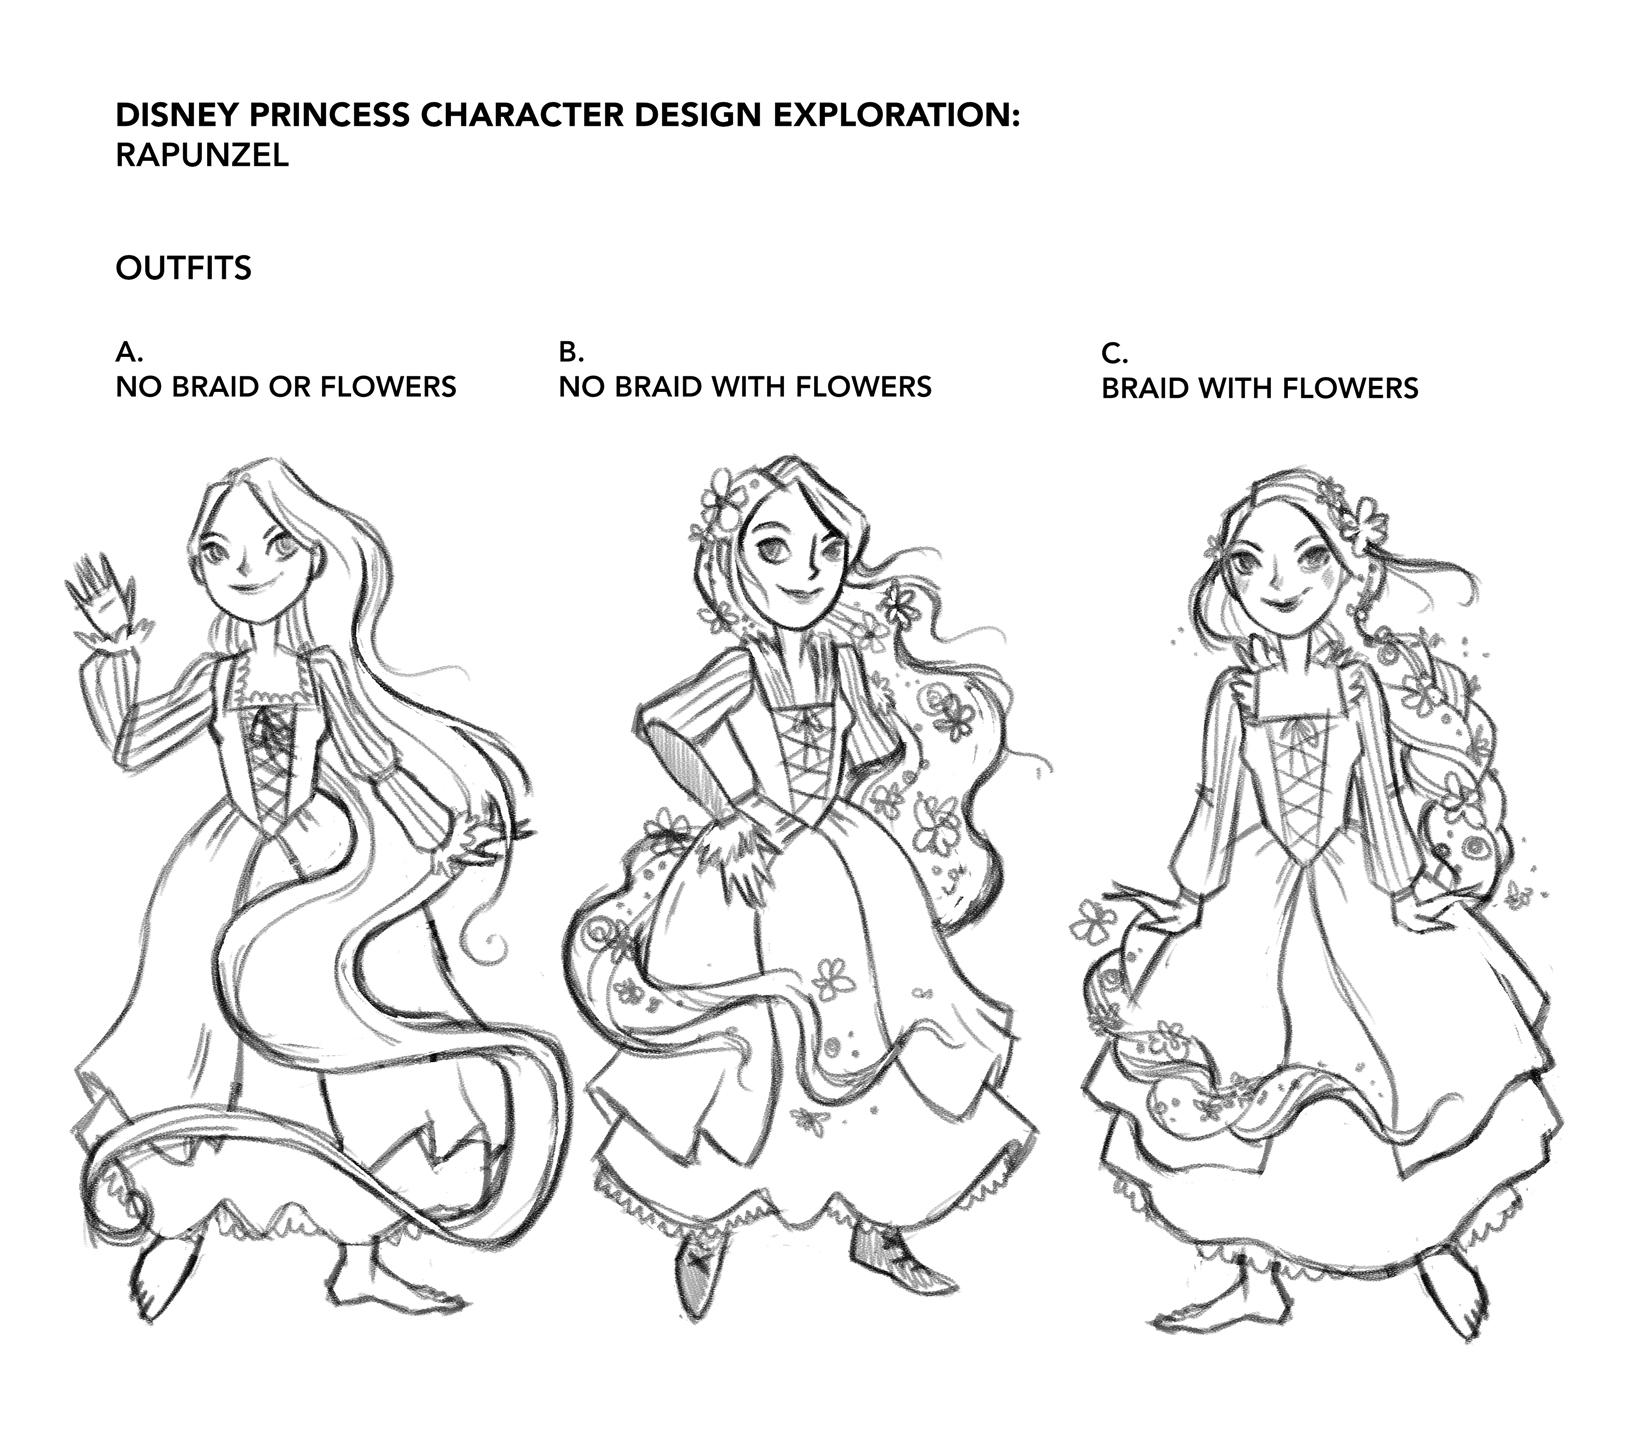 Disney_Roughs_Rapunzel.jpg